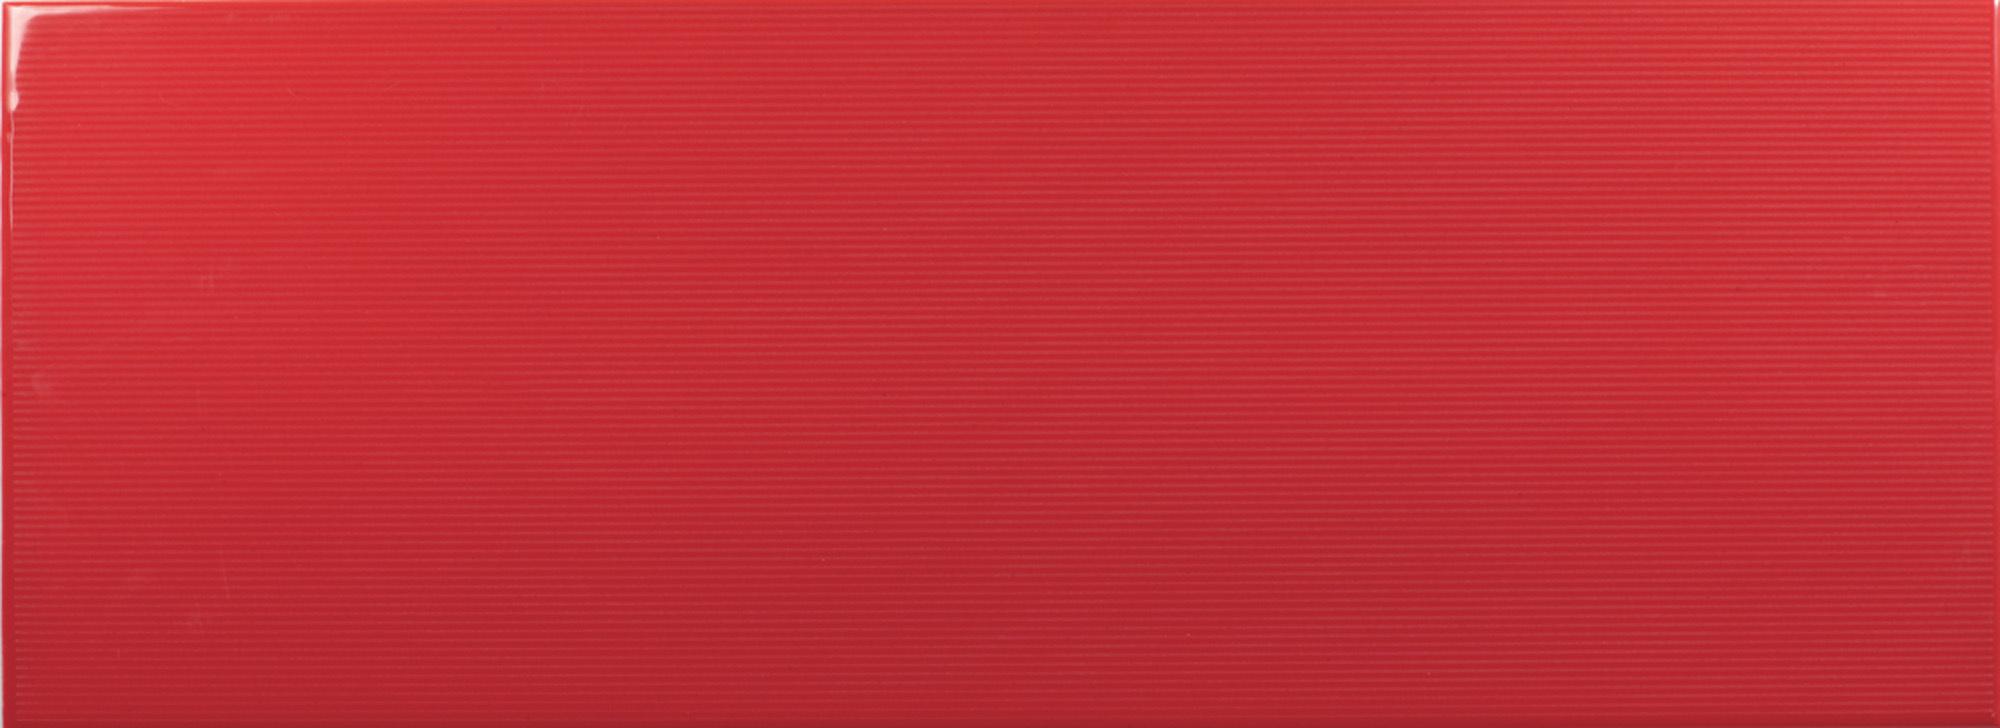 Johnson VVD4A Vivid Red Gloss Brick Ceramic Wall Tile (400x150x10mm)